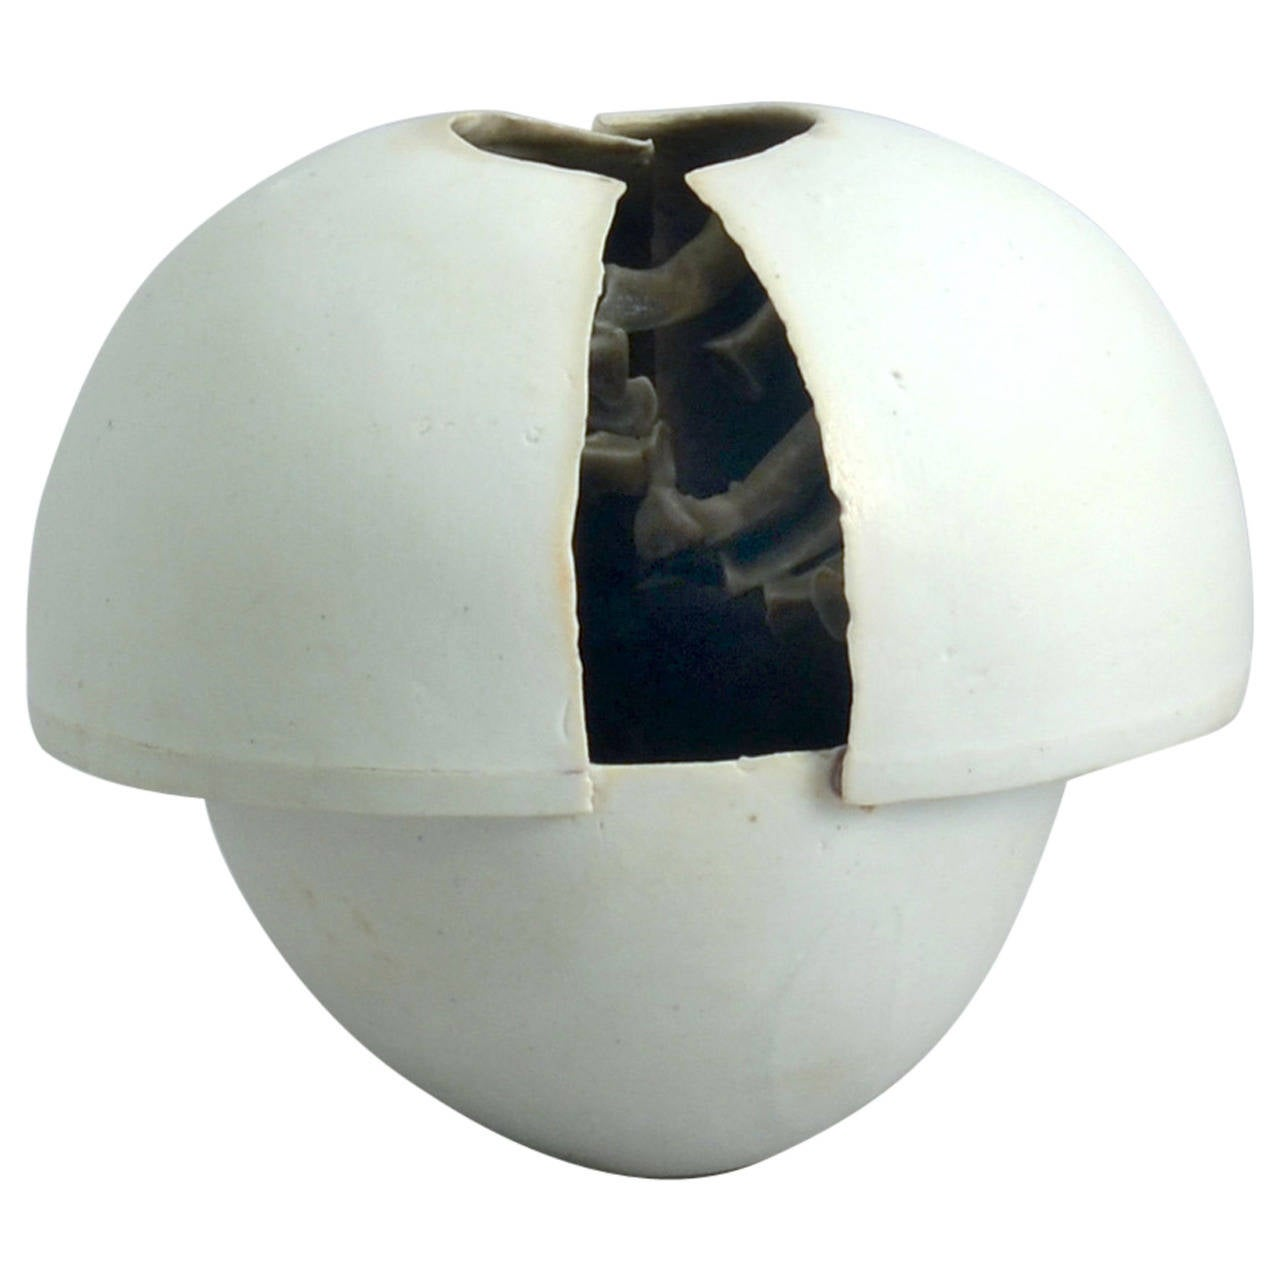 Ruth Duckworth Sculptural Form at 1stdibs